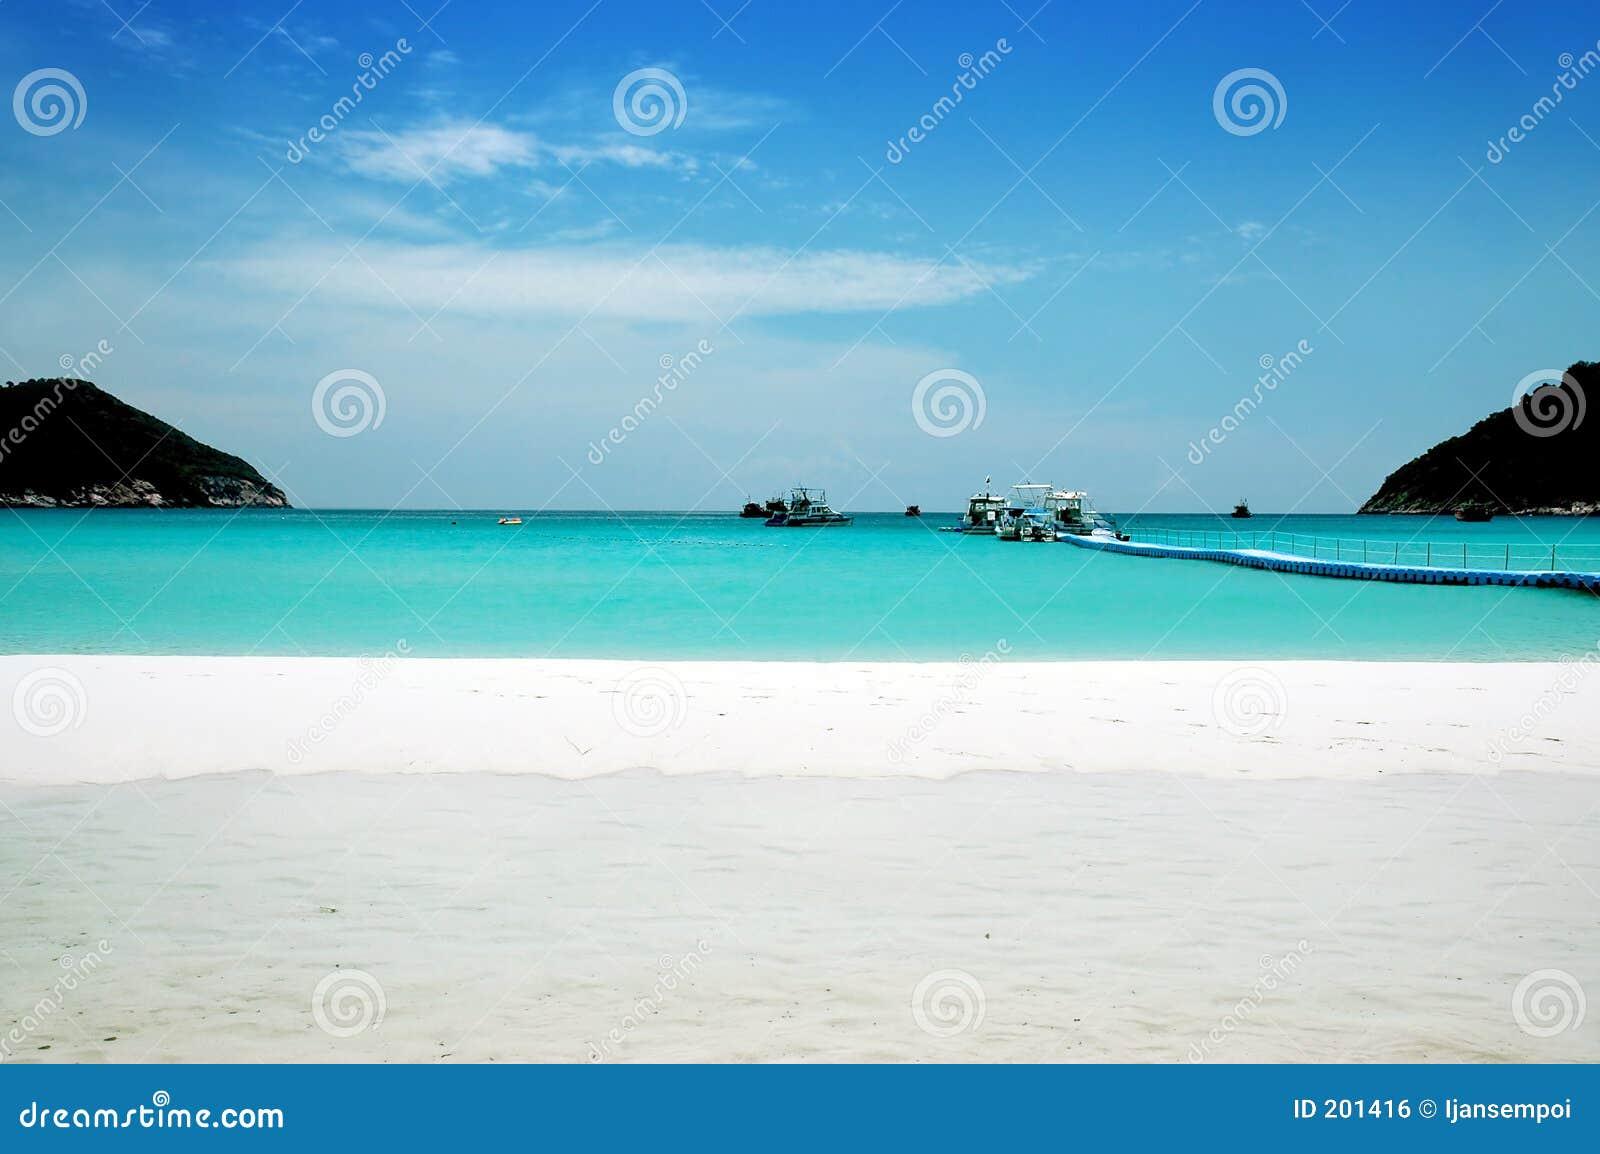 Beautiful Beach Scenery Beautiful beach scenery